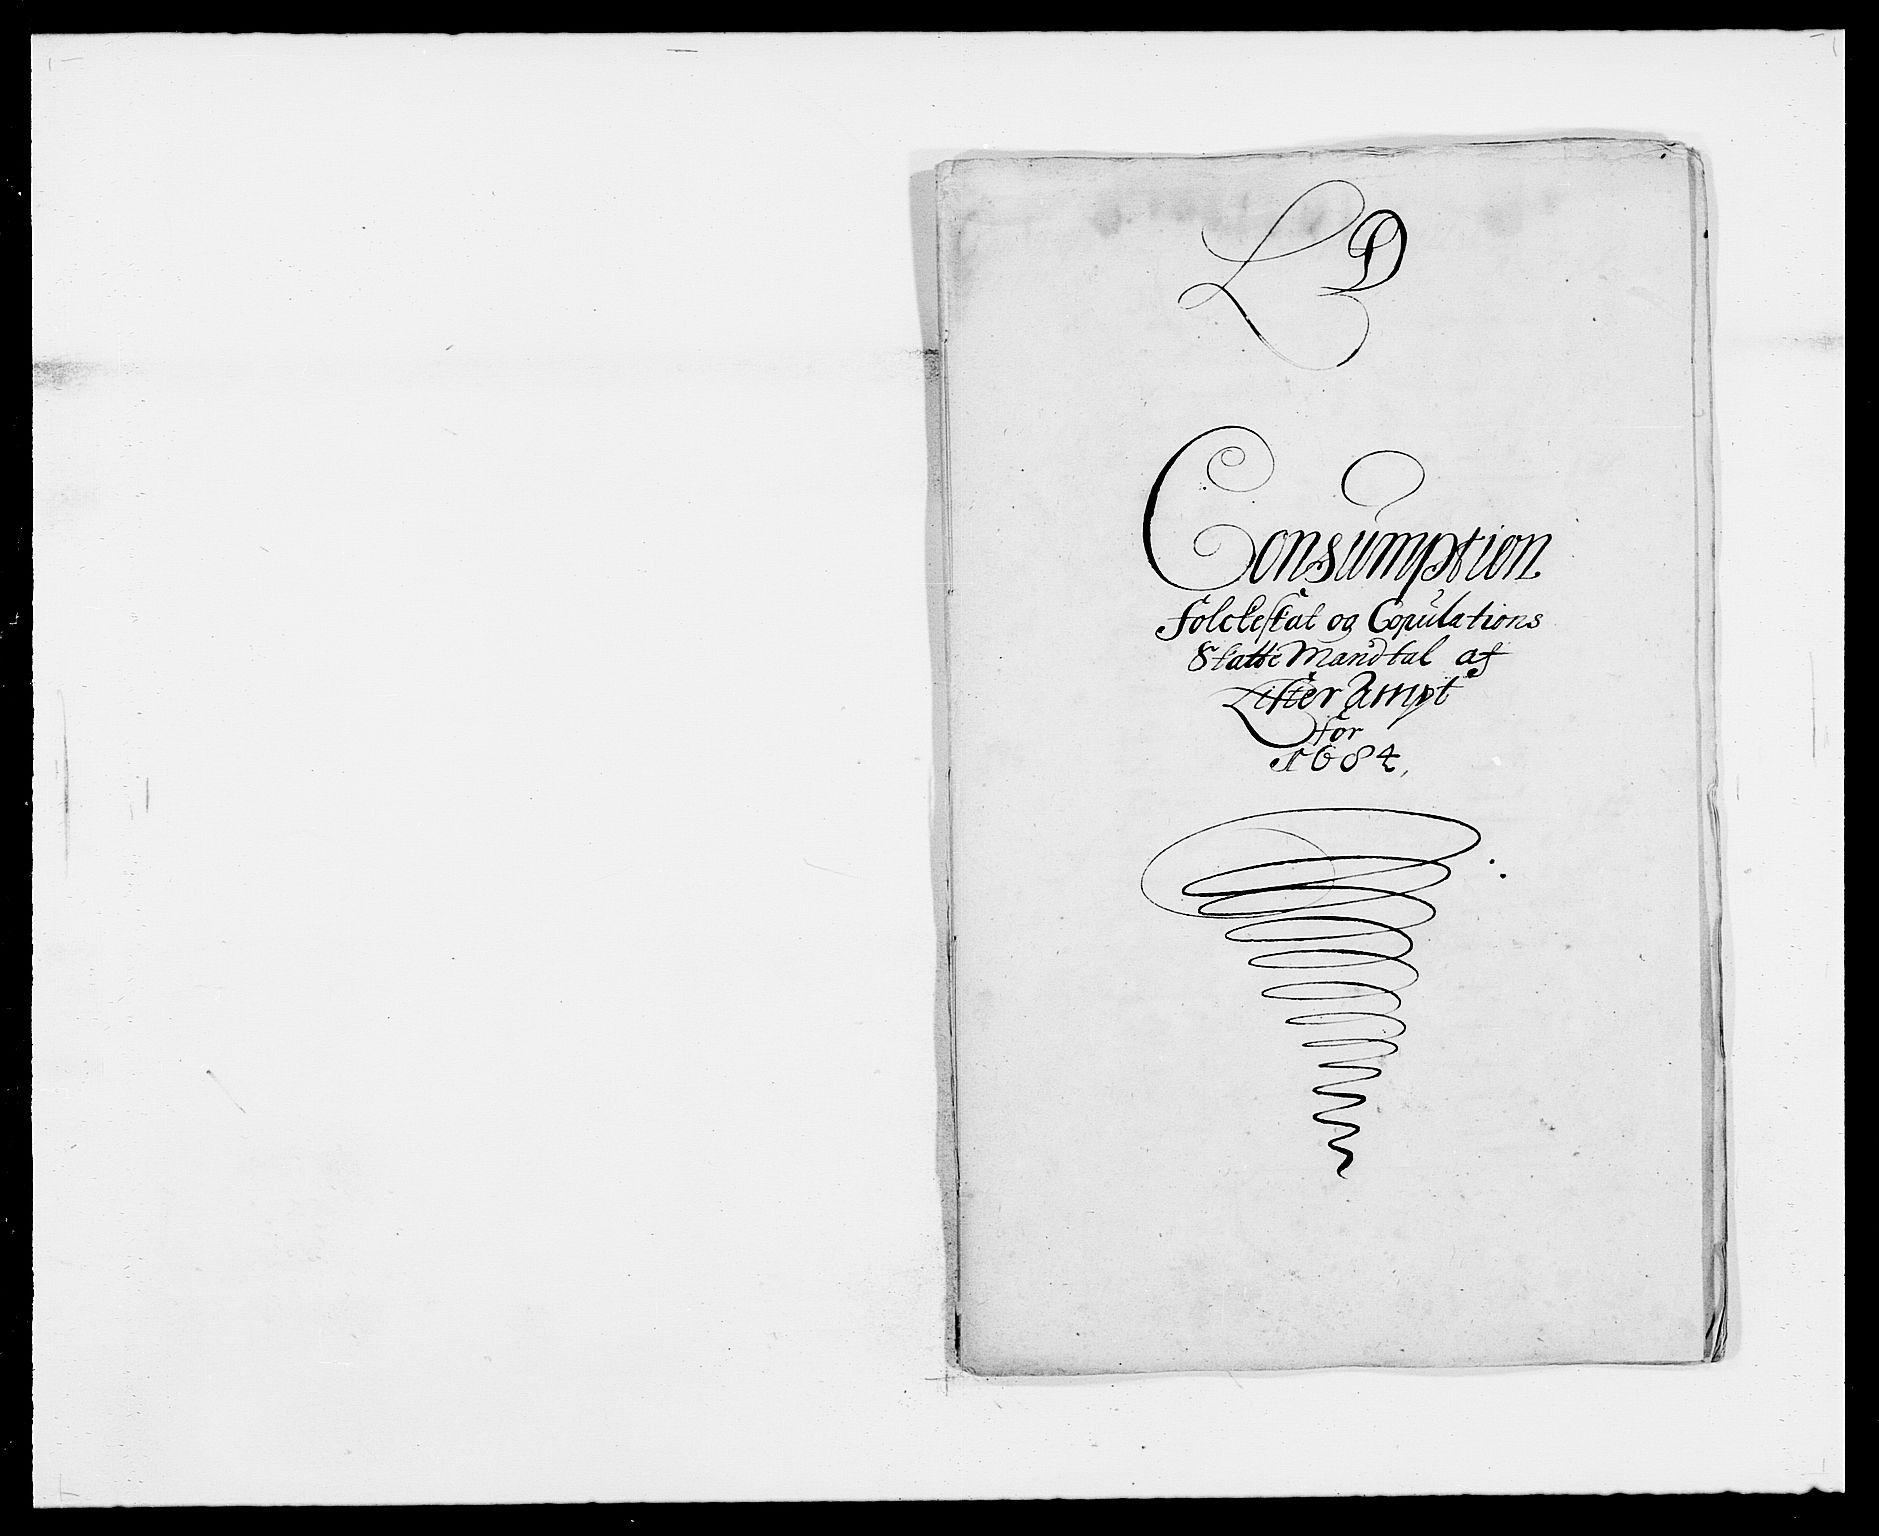 RA, Rentekammeret inntil 1814, Reviderte regnskaper, Fogderegnskap, R41/L2533: Fogderegnskap Lista, 1684-1685, s. 78